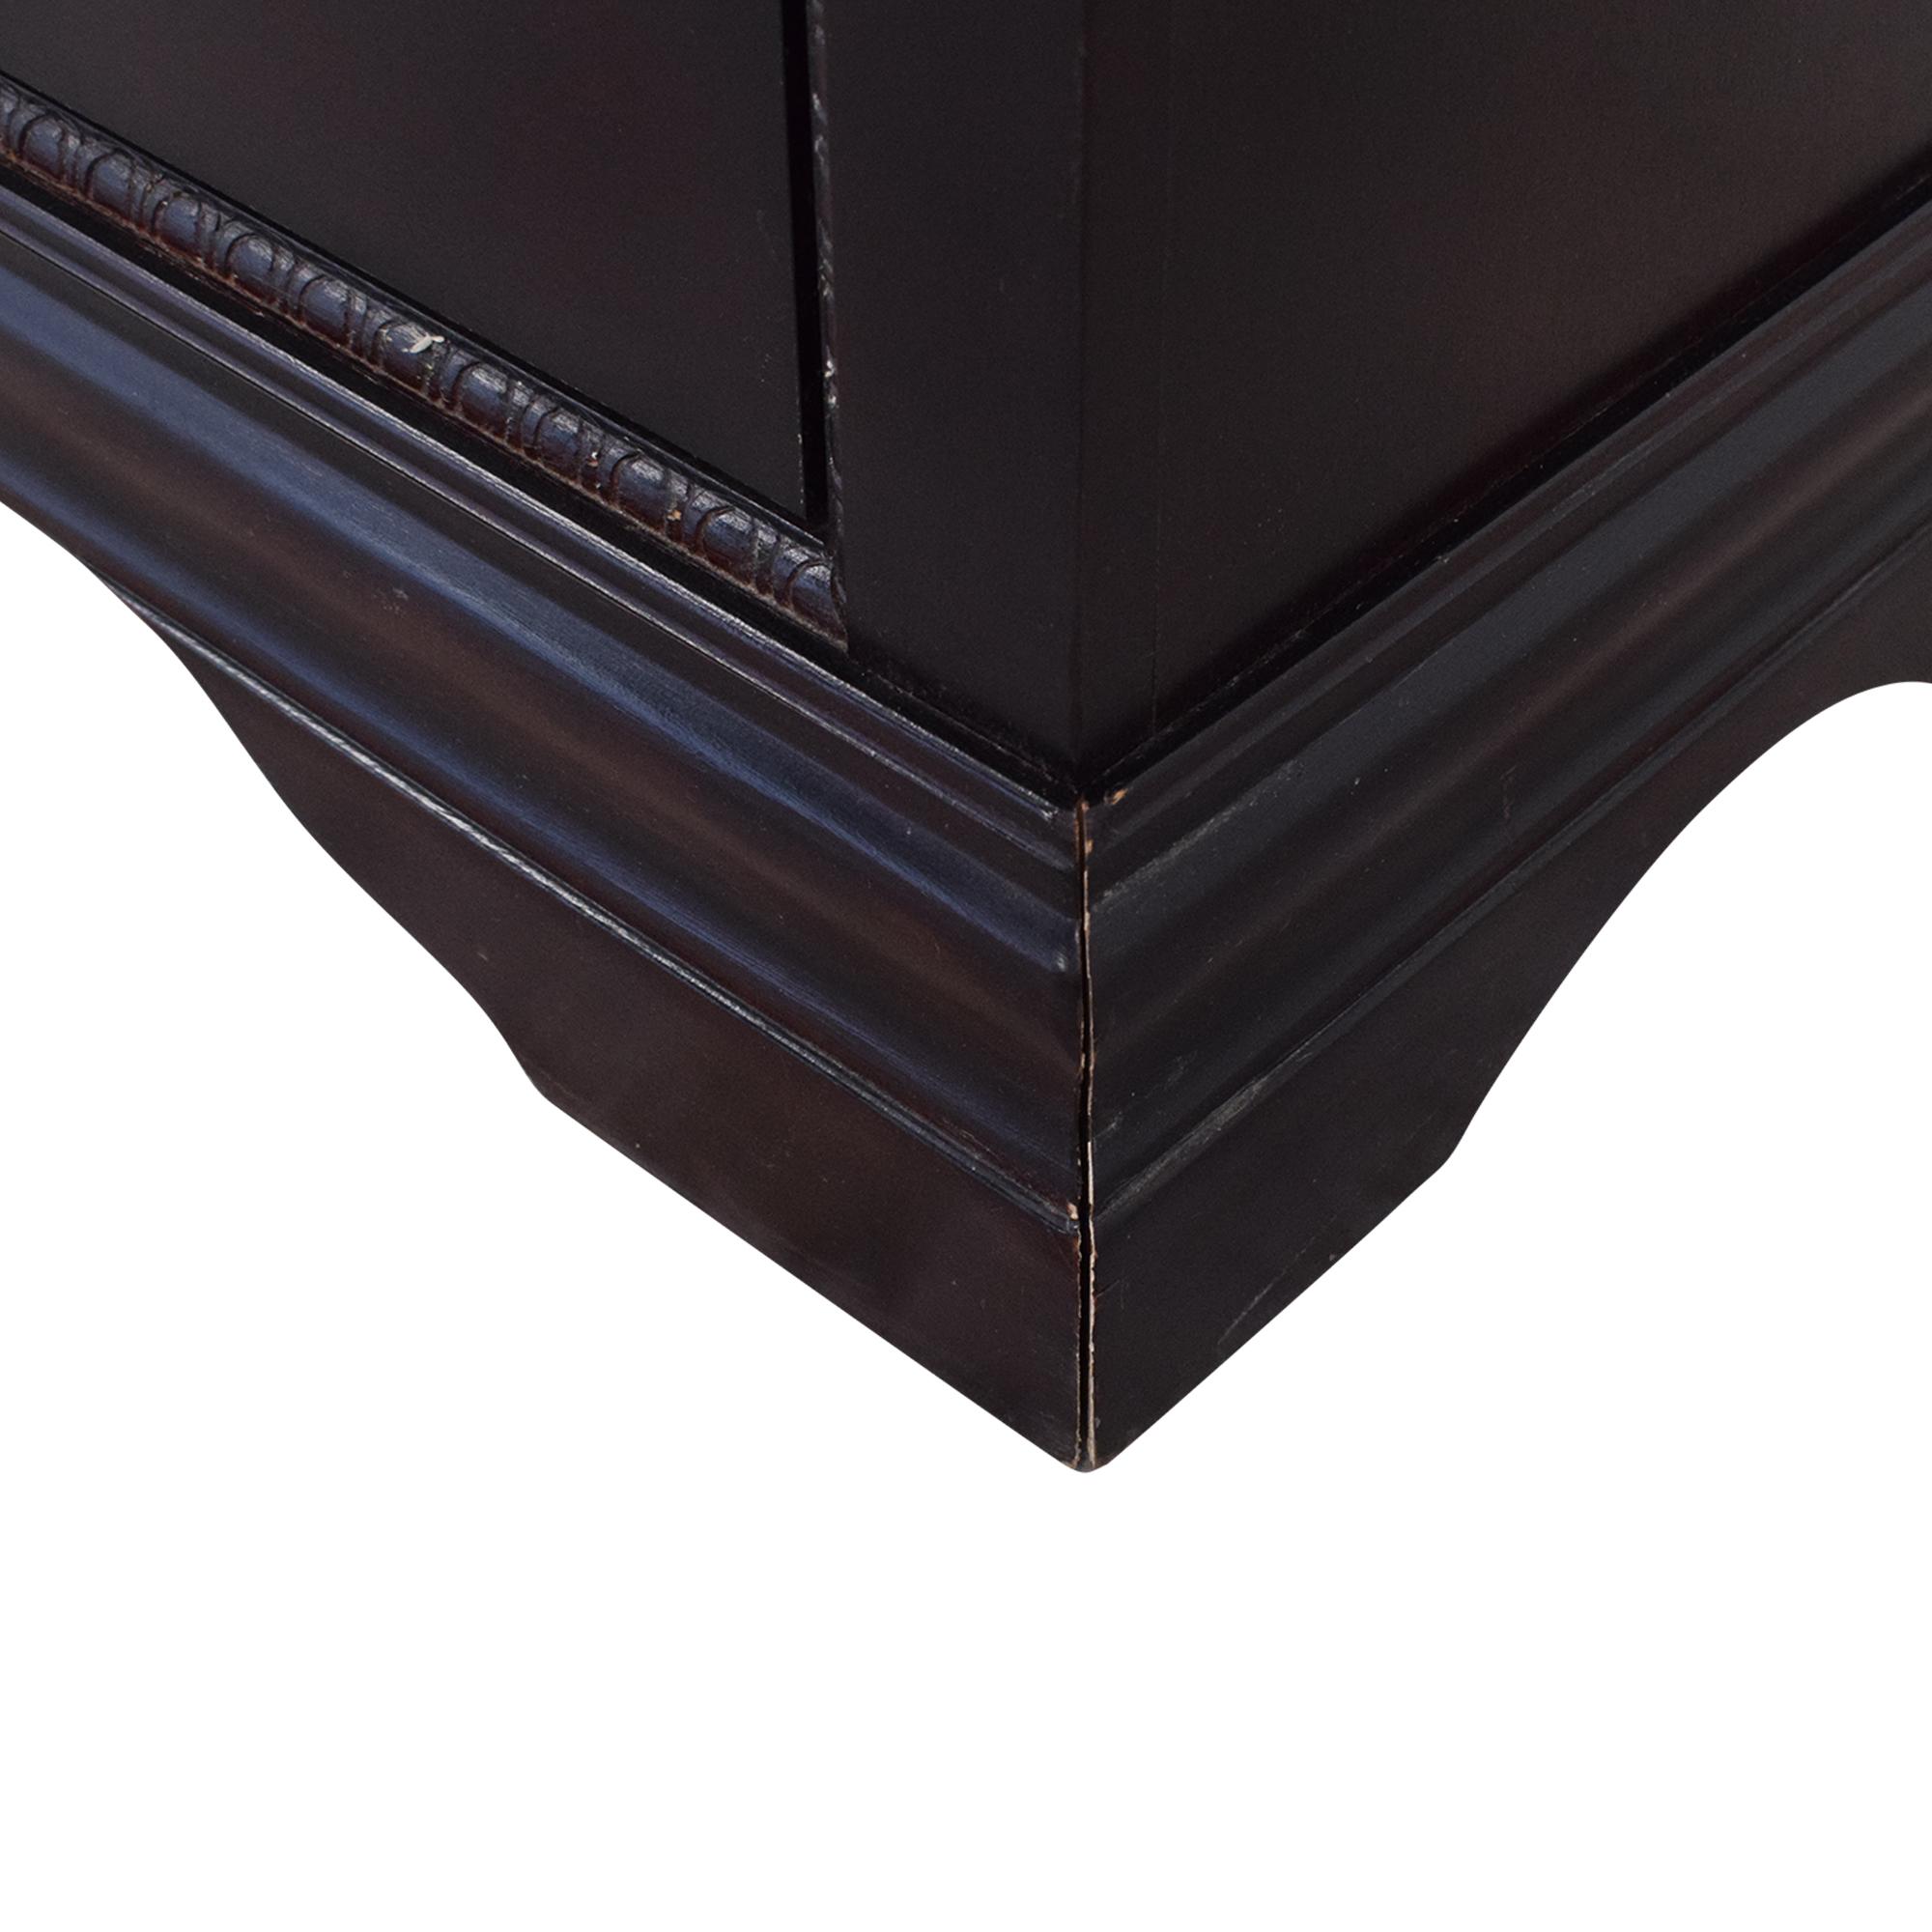 JTB Furniture JTB Furniture Nightstand for sale